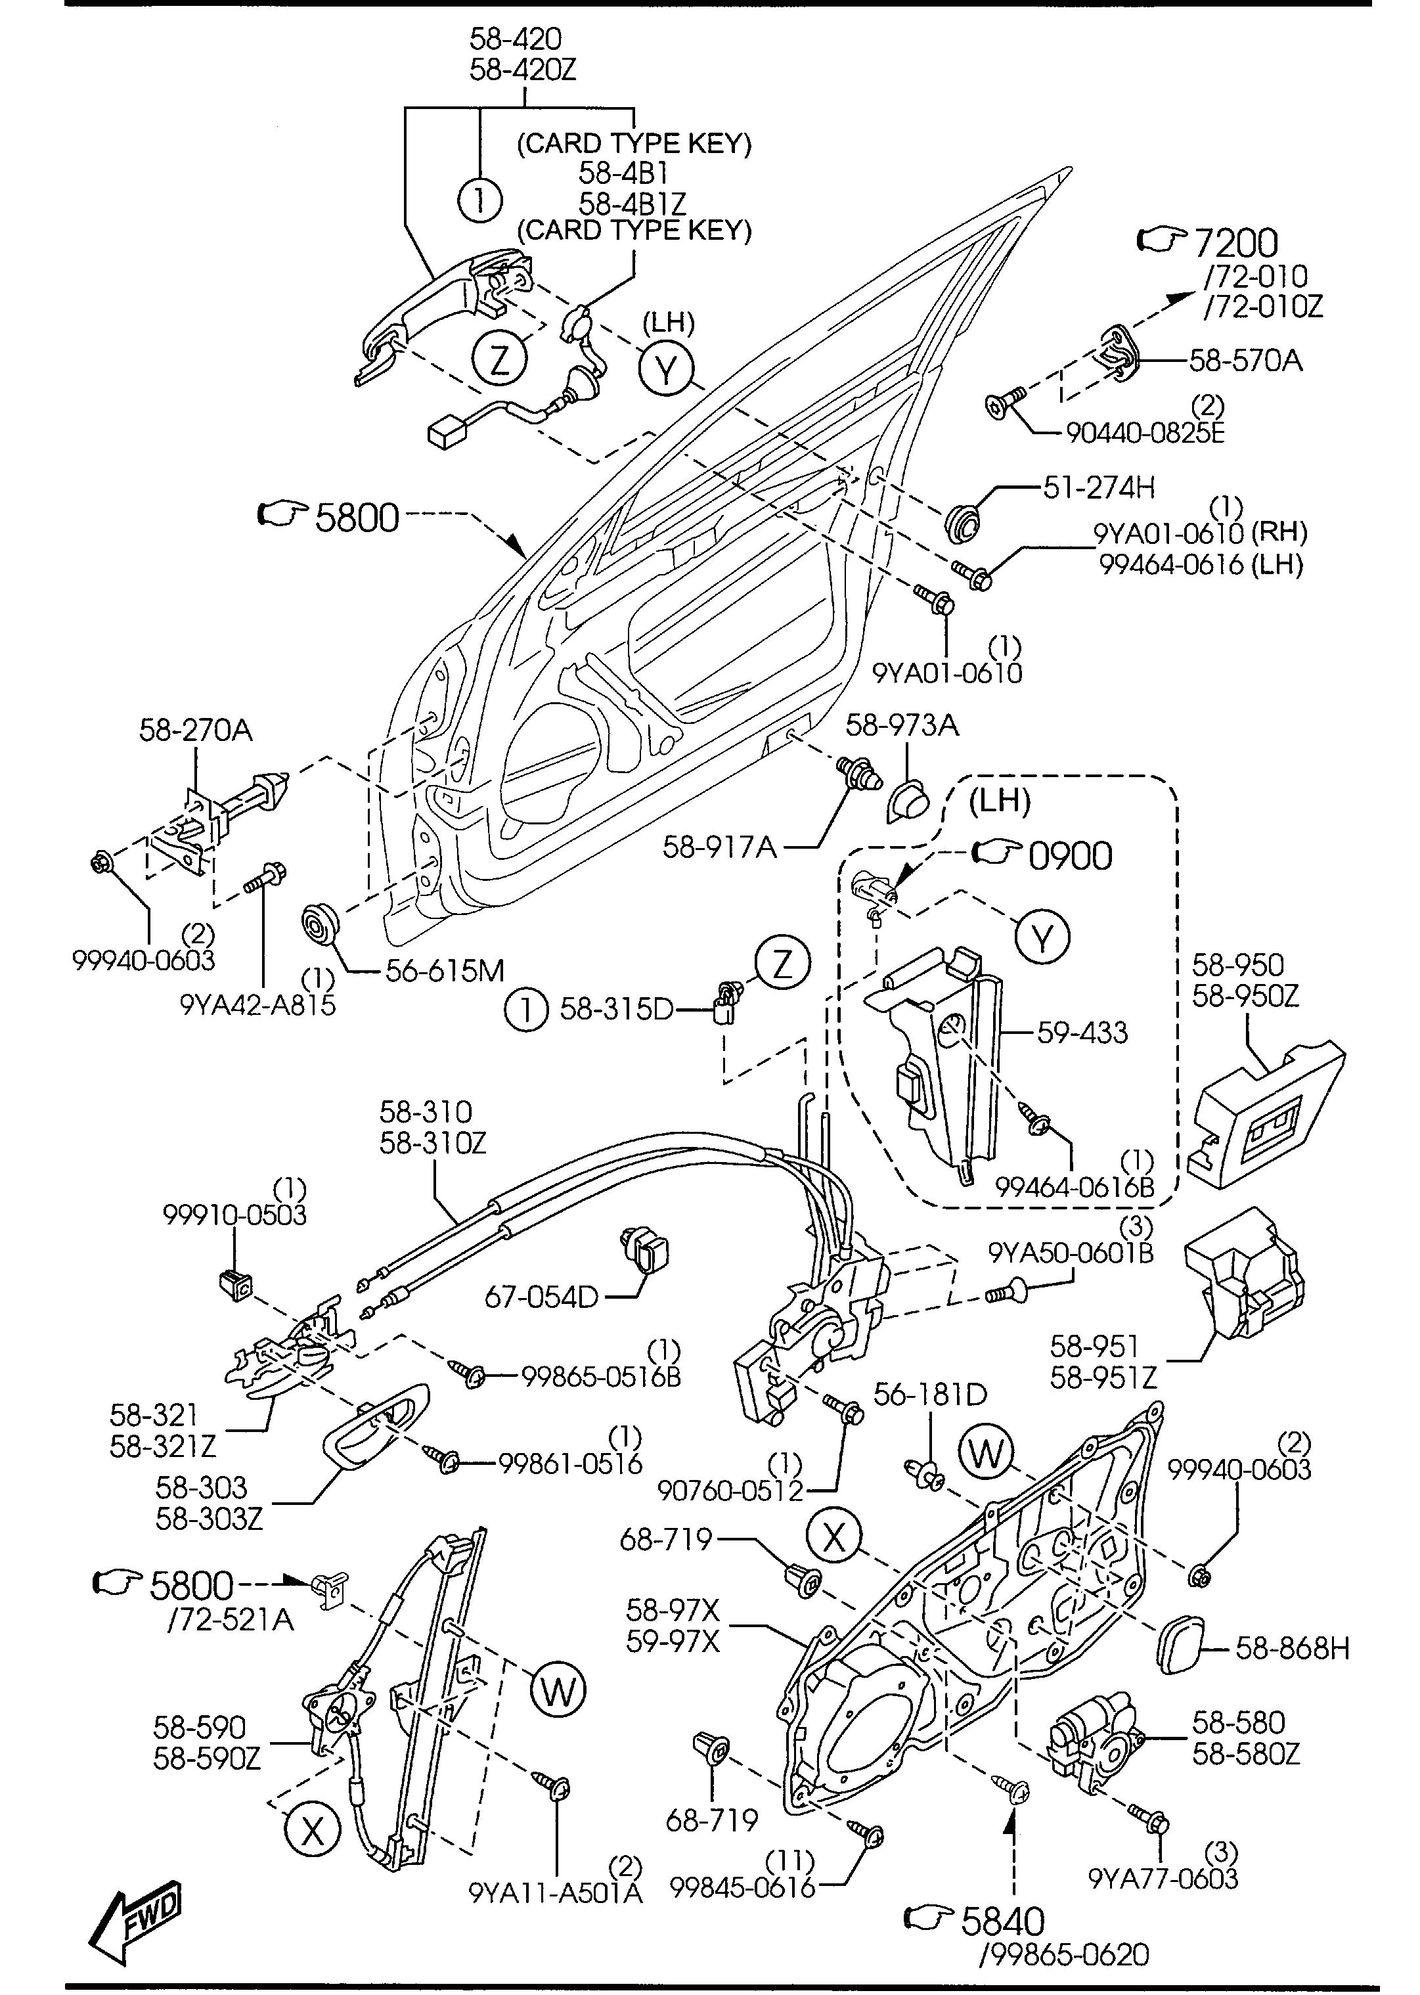 2004 Mazda Rx8 Engine Diagram Schematic Diagrams Rx 8 Parts Product Wiring U2022 2000 Mpv